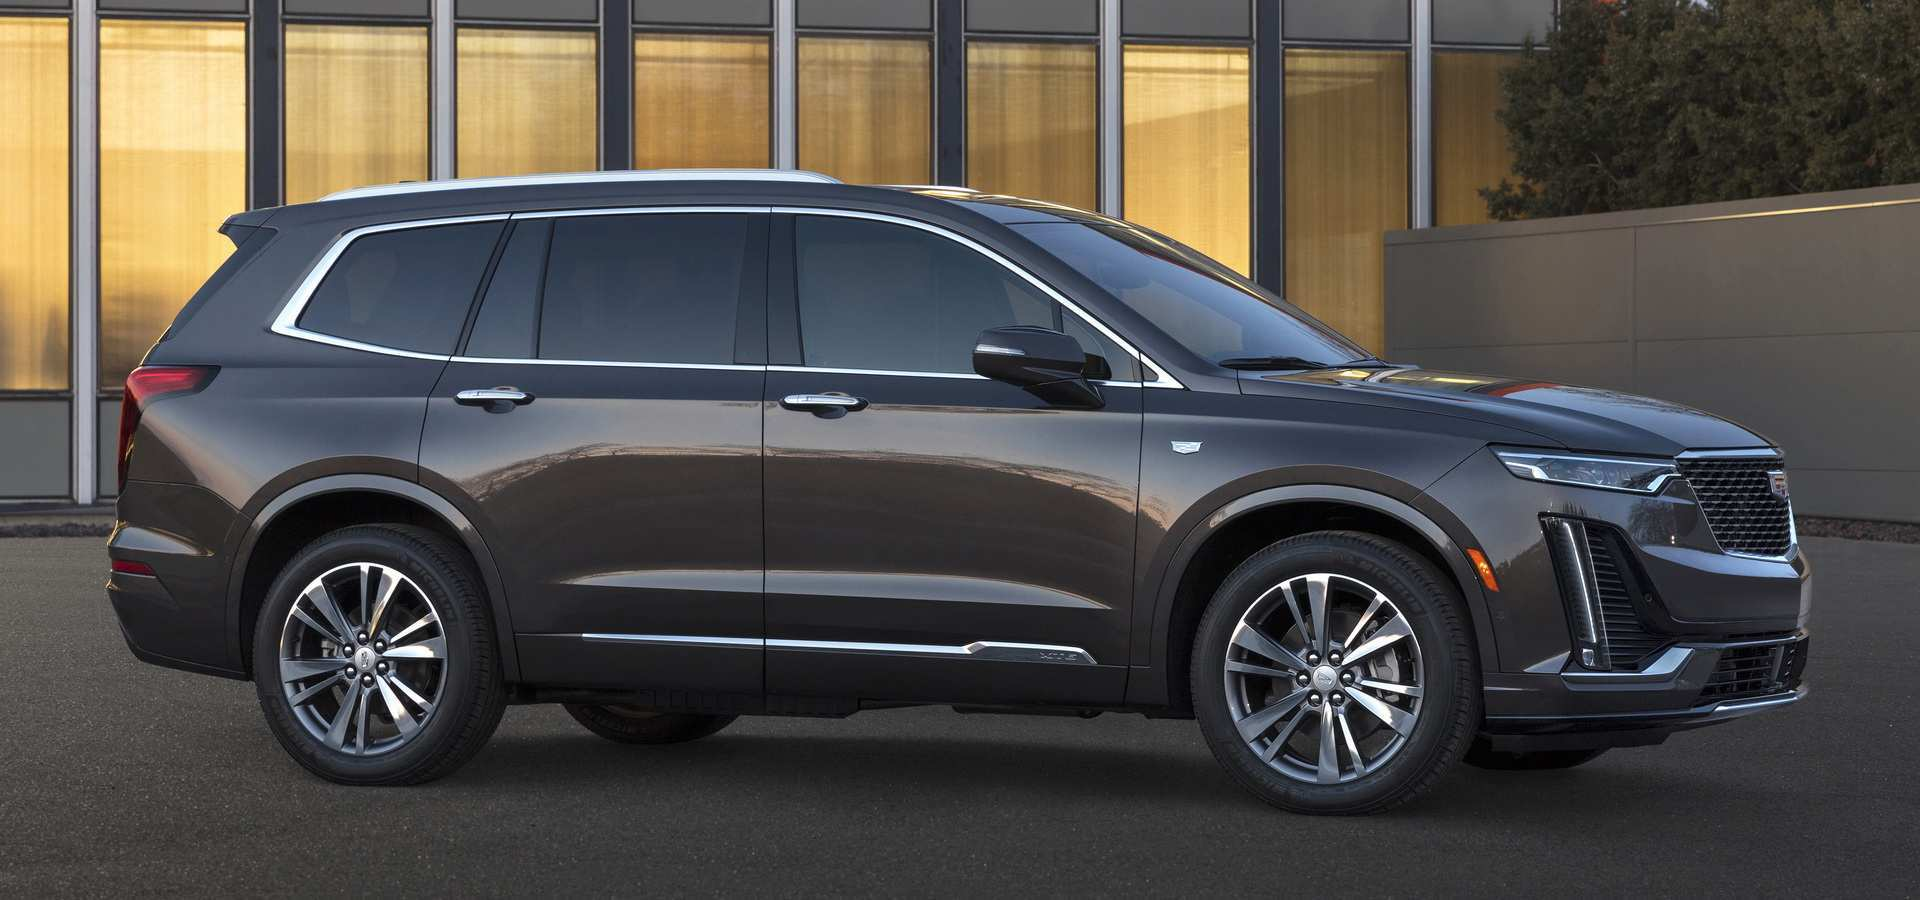 24 All New 2020 Lincoln Aviator Vs Cadillac Xt6 Concept by 2020 Lincoln Aviator Vs Cadillac Xt6